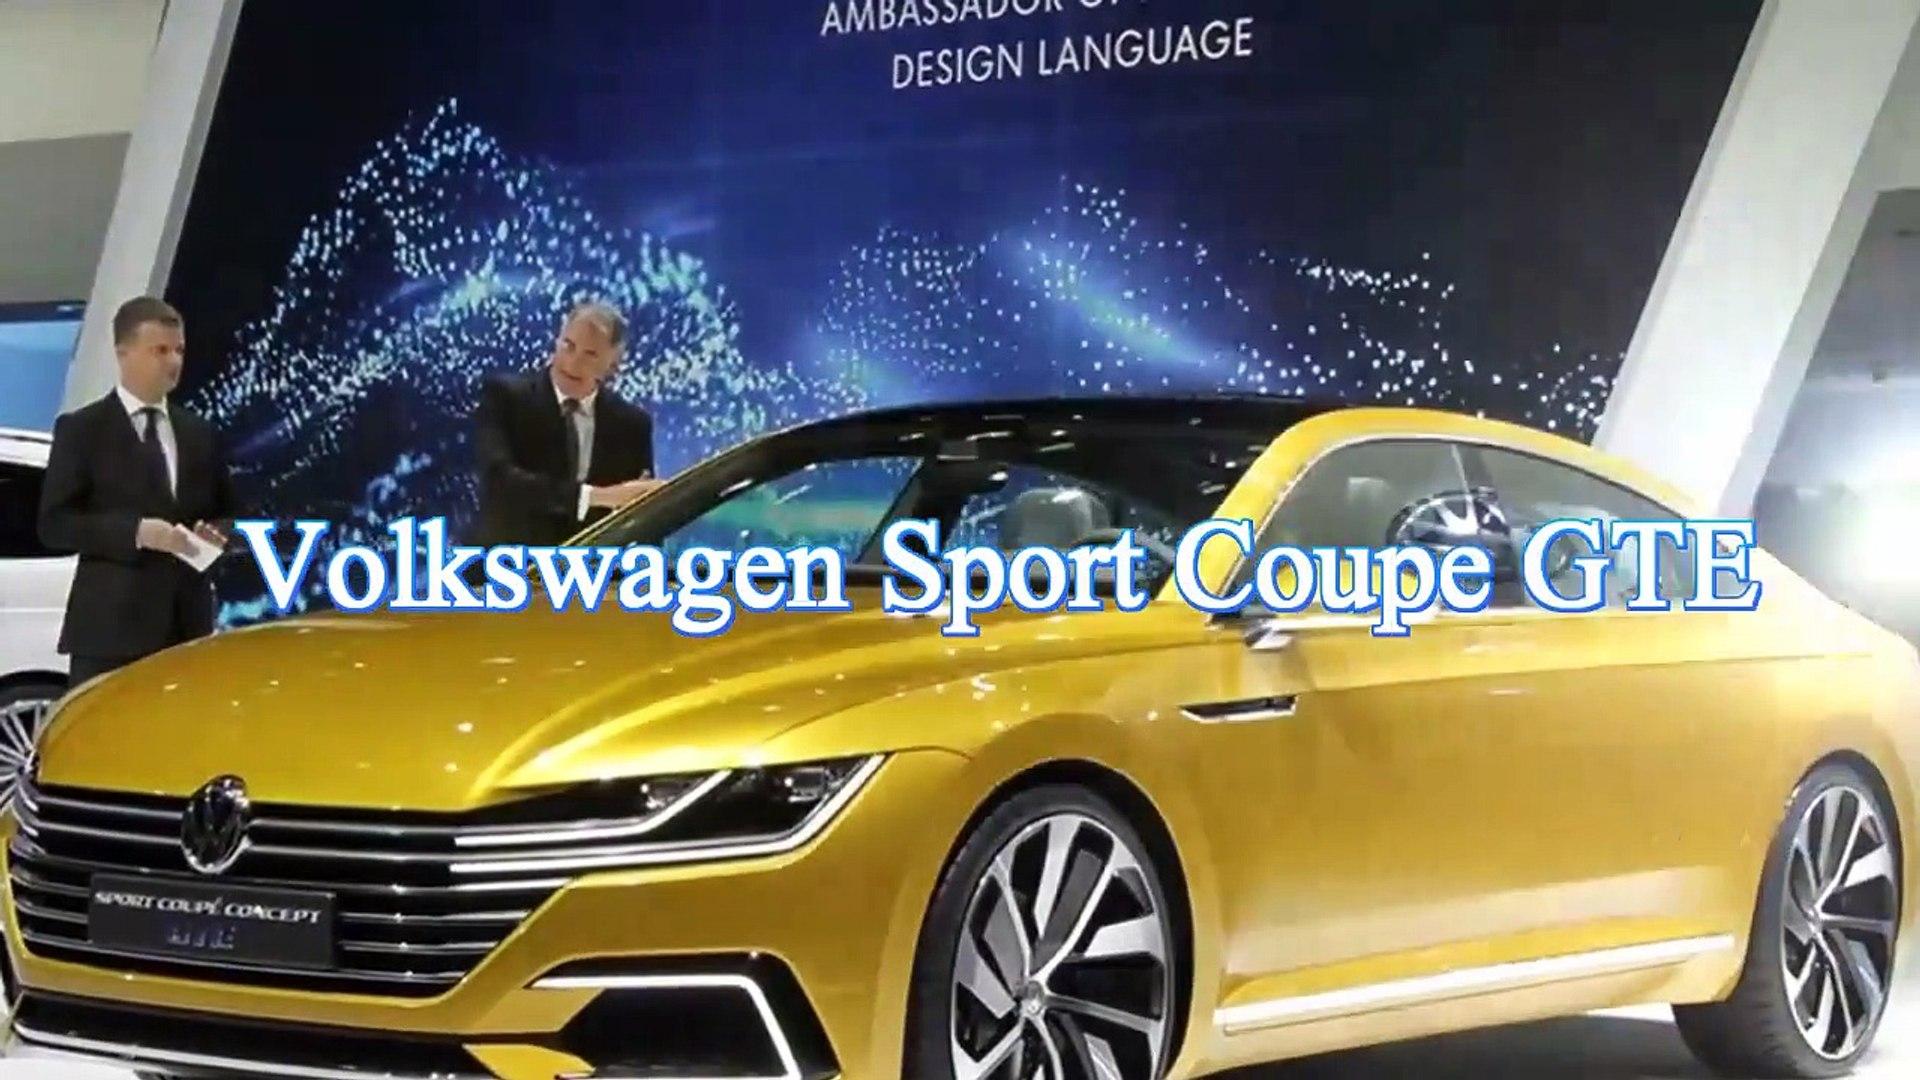 Best Sport Cars ~ Volkswagen Sport Coupwerwer234e G